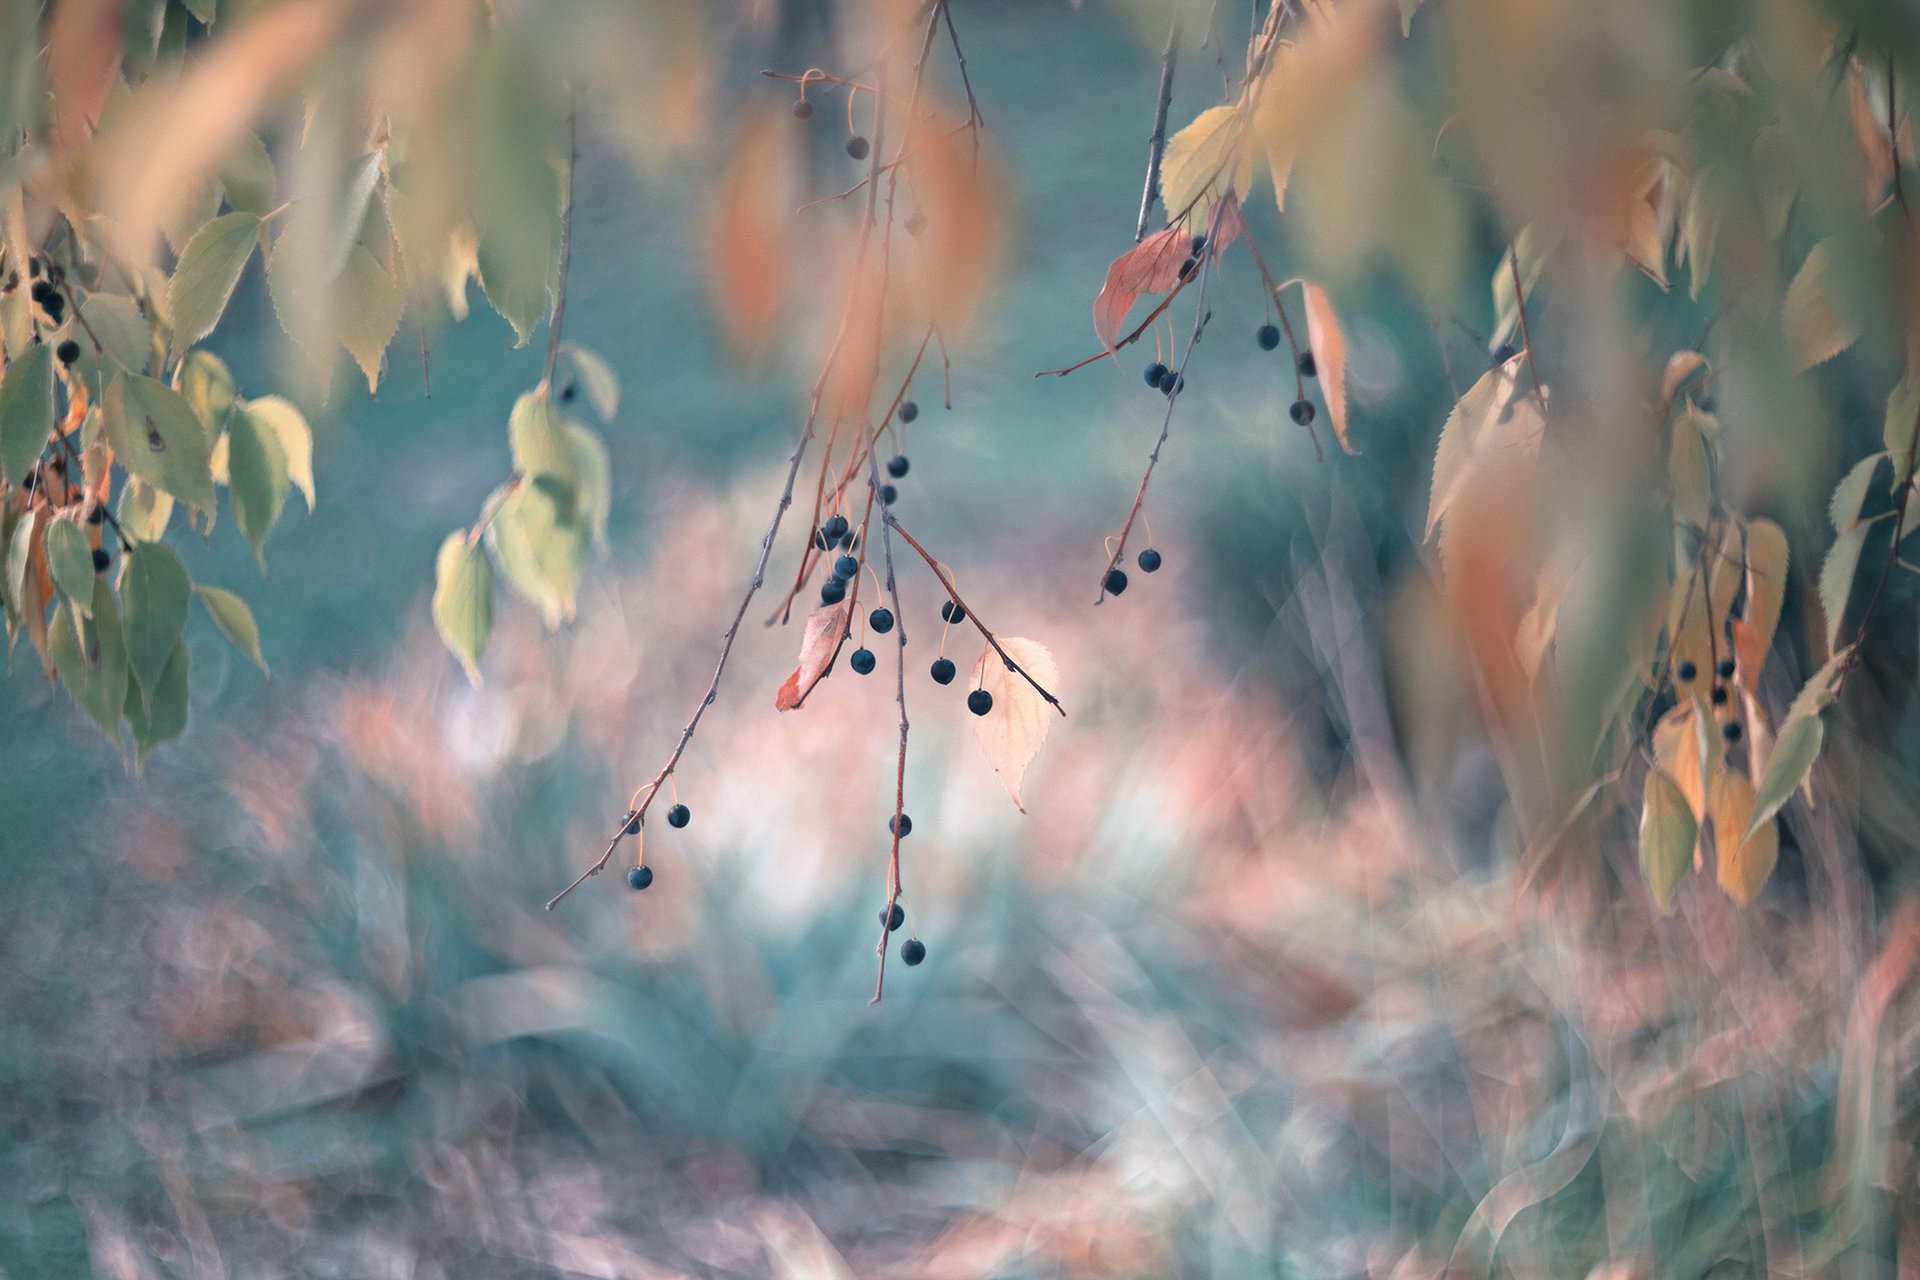 Photo in Nature | Author Nayden Bochev - NAKATA211 | PHOTO FORUM